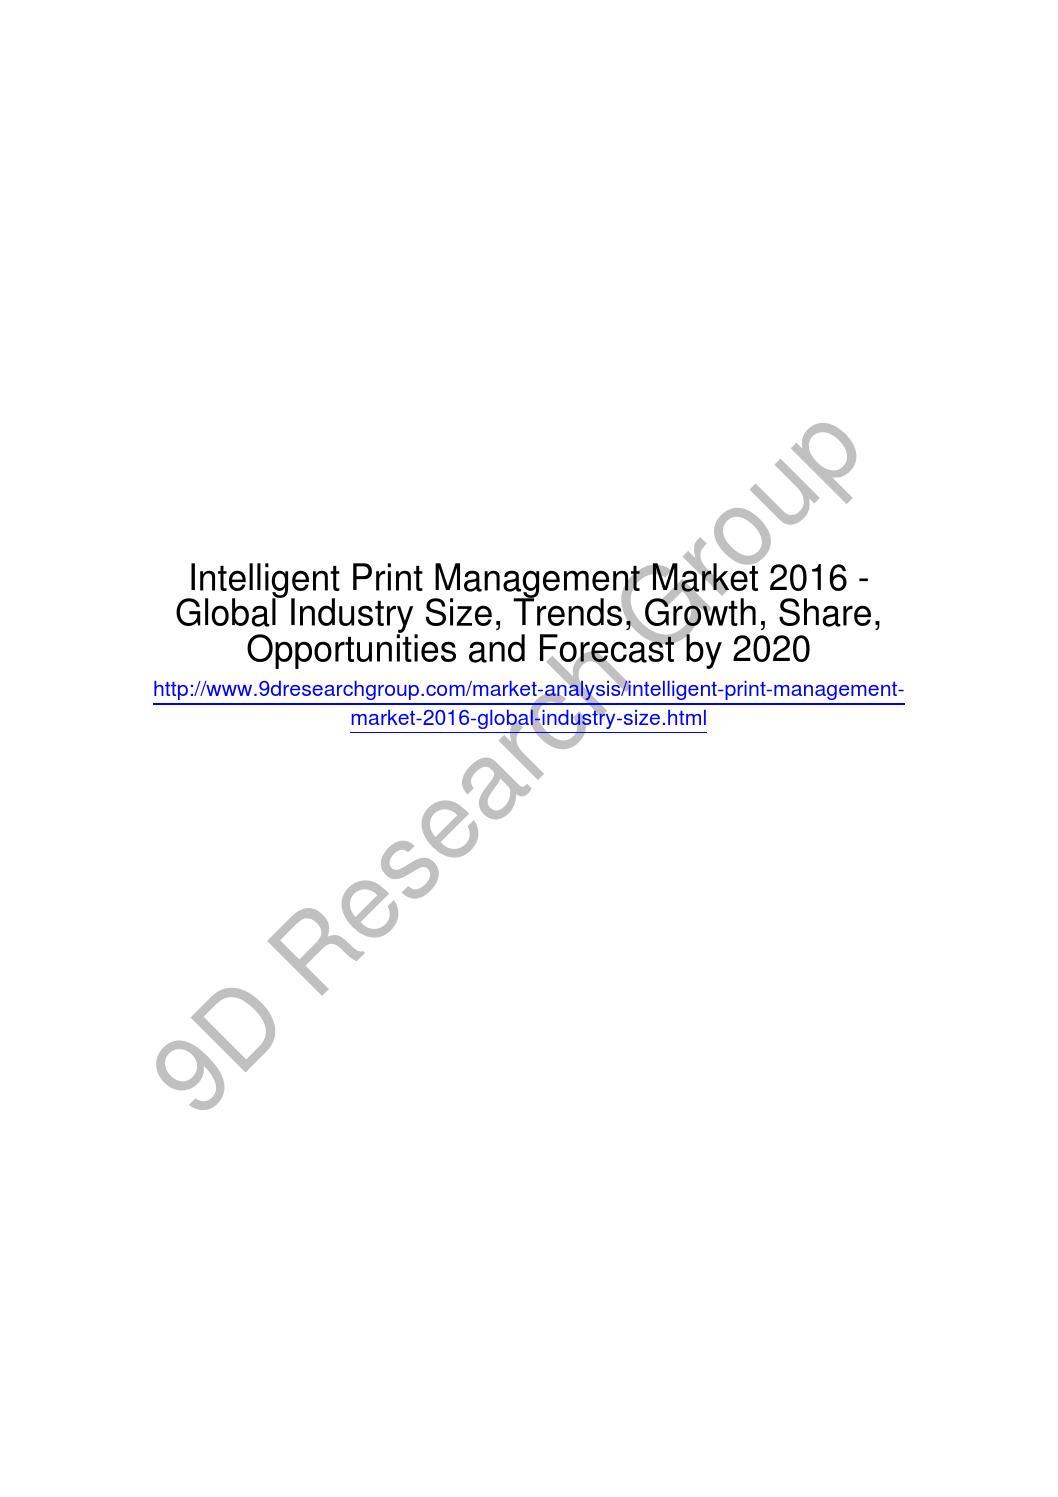 Intelligent print management market 2016 global industry